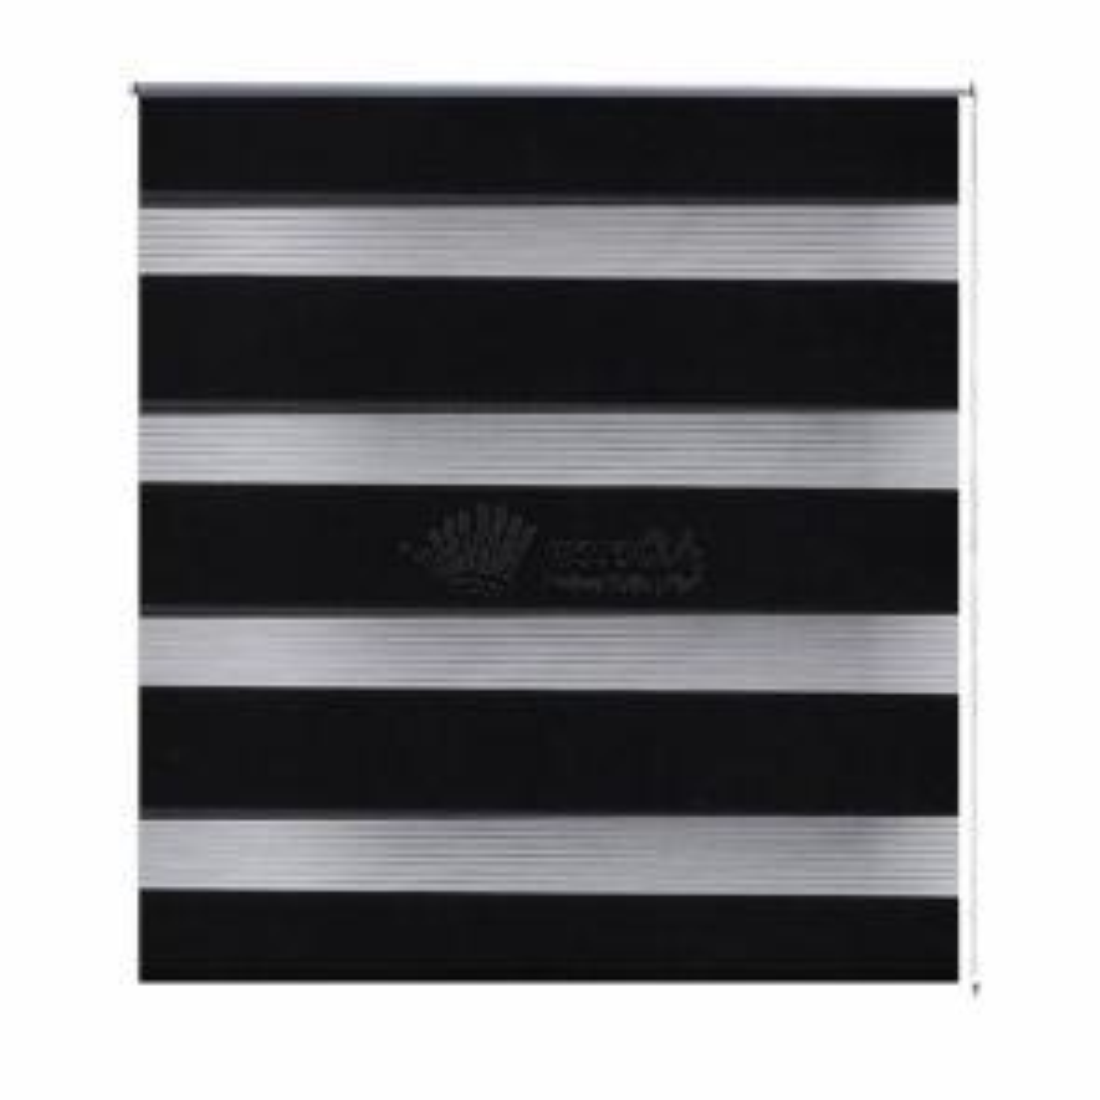 Roleta Zebra / noc a den / Twinroll 120 x 230 cm, černá